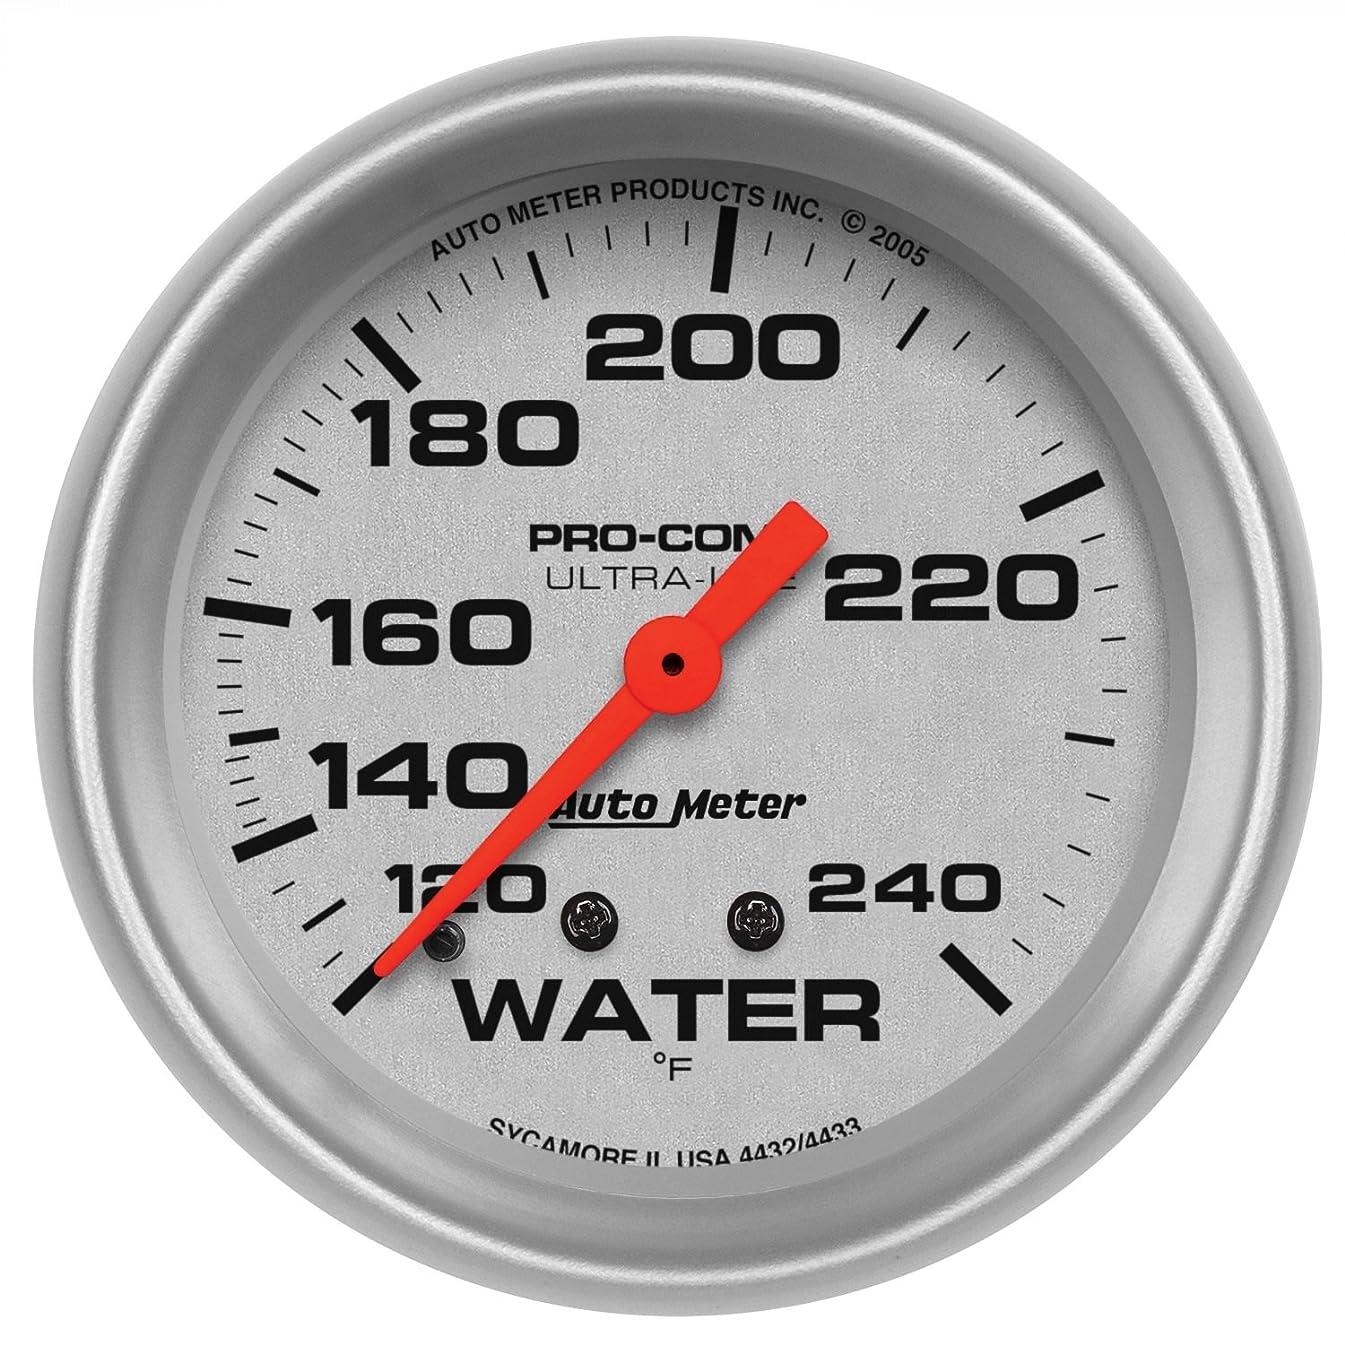 Auto Meter 4433 Ultra-Lite Mechanical Water Temperature Gauge